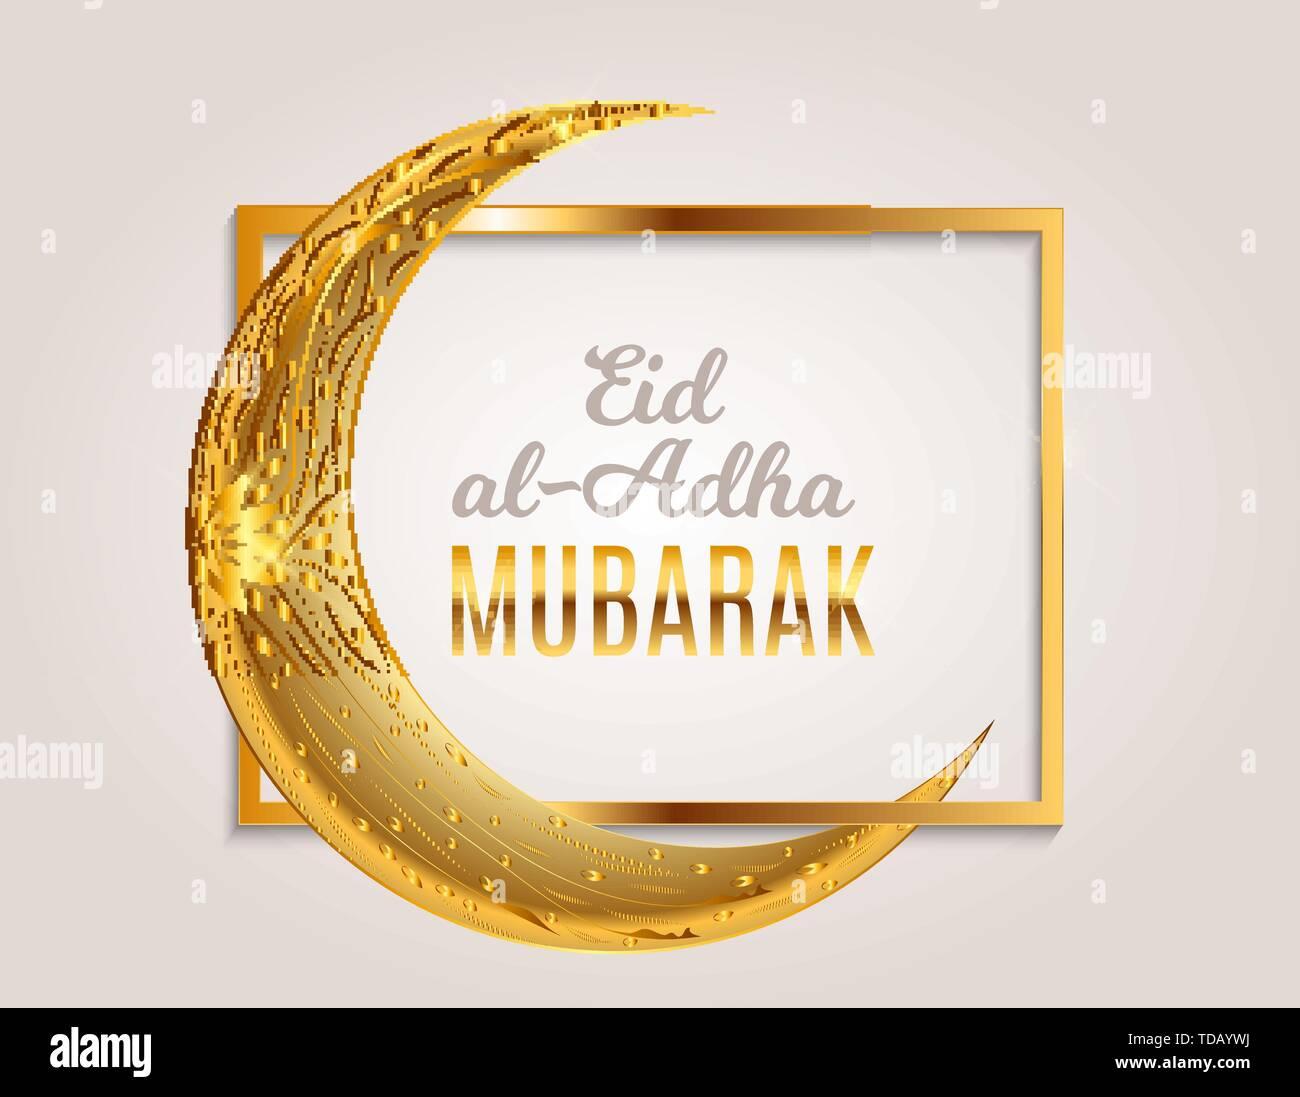 Eid al-Adha, Kurban Bayrami muslim festival of sacrifice